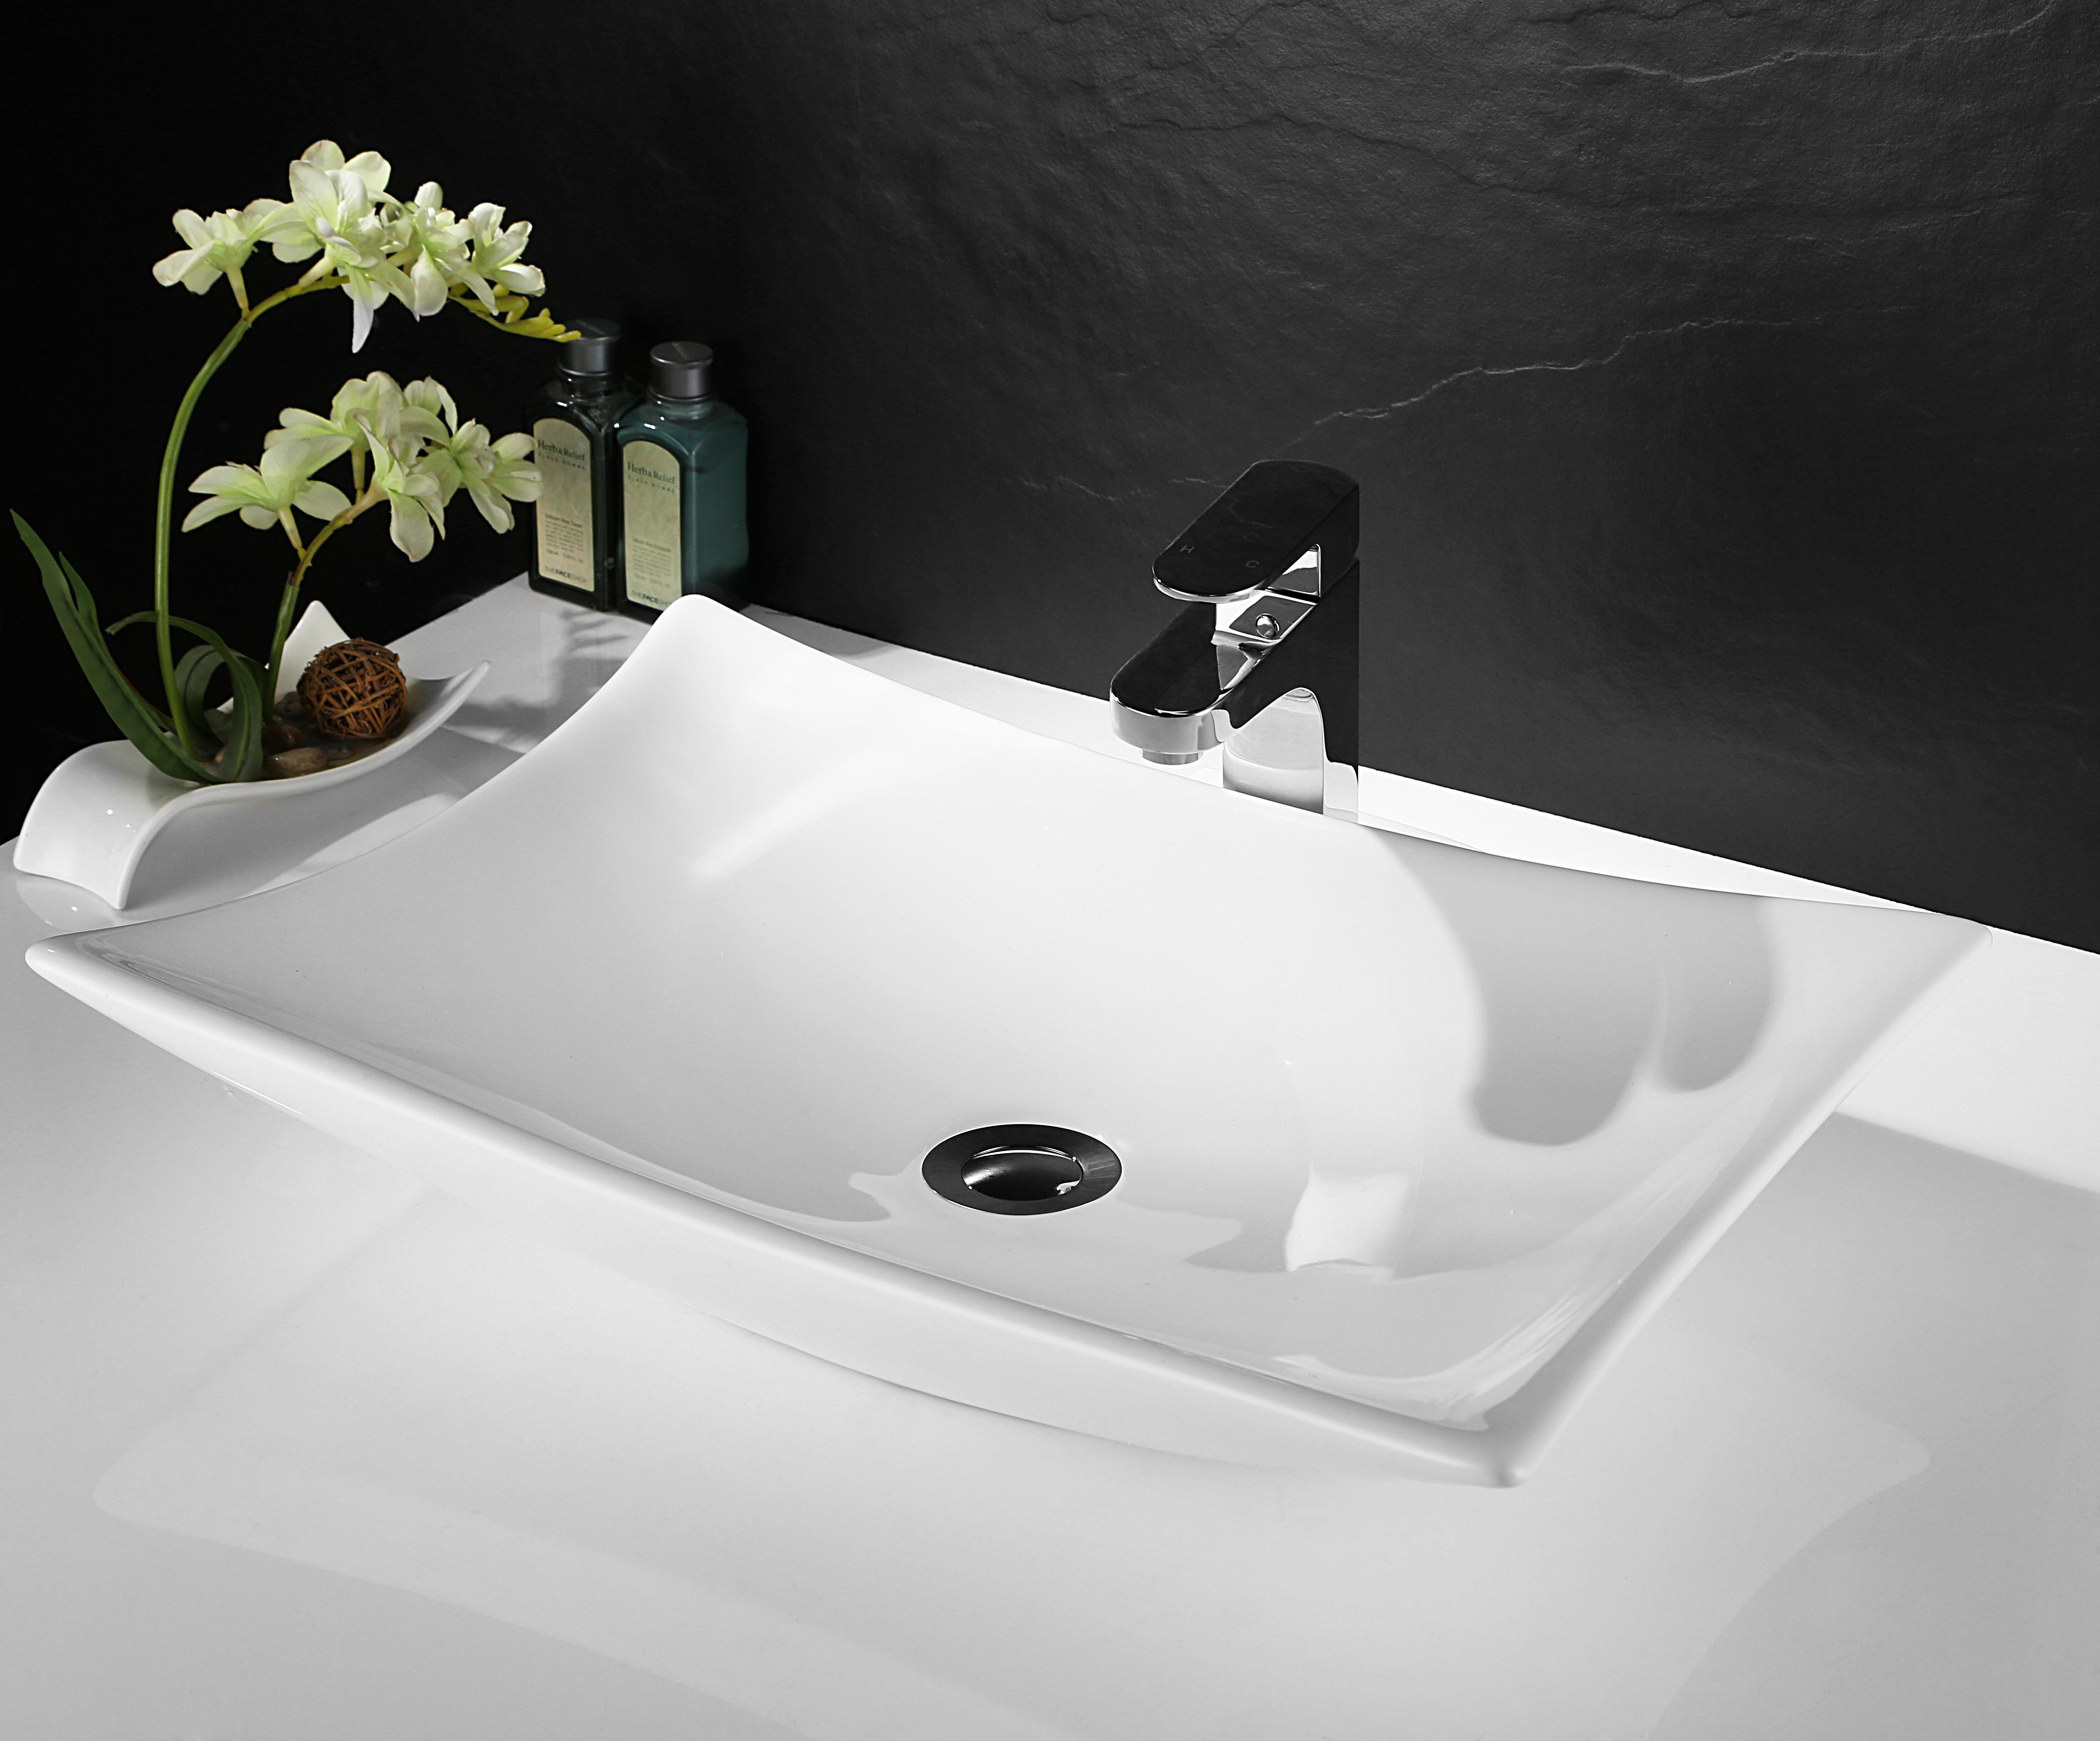 Basin Top Ceramic Wash Basin Bathroom Sink Bowl Gloss Above Counter Top Vanity inside dimensions 4632 X 3840